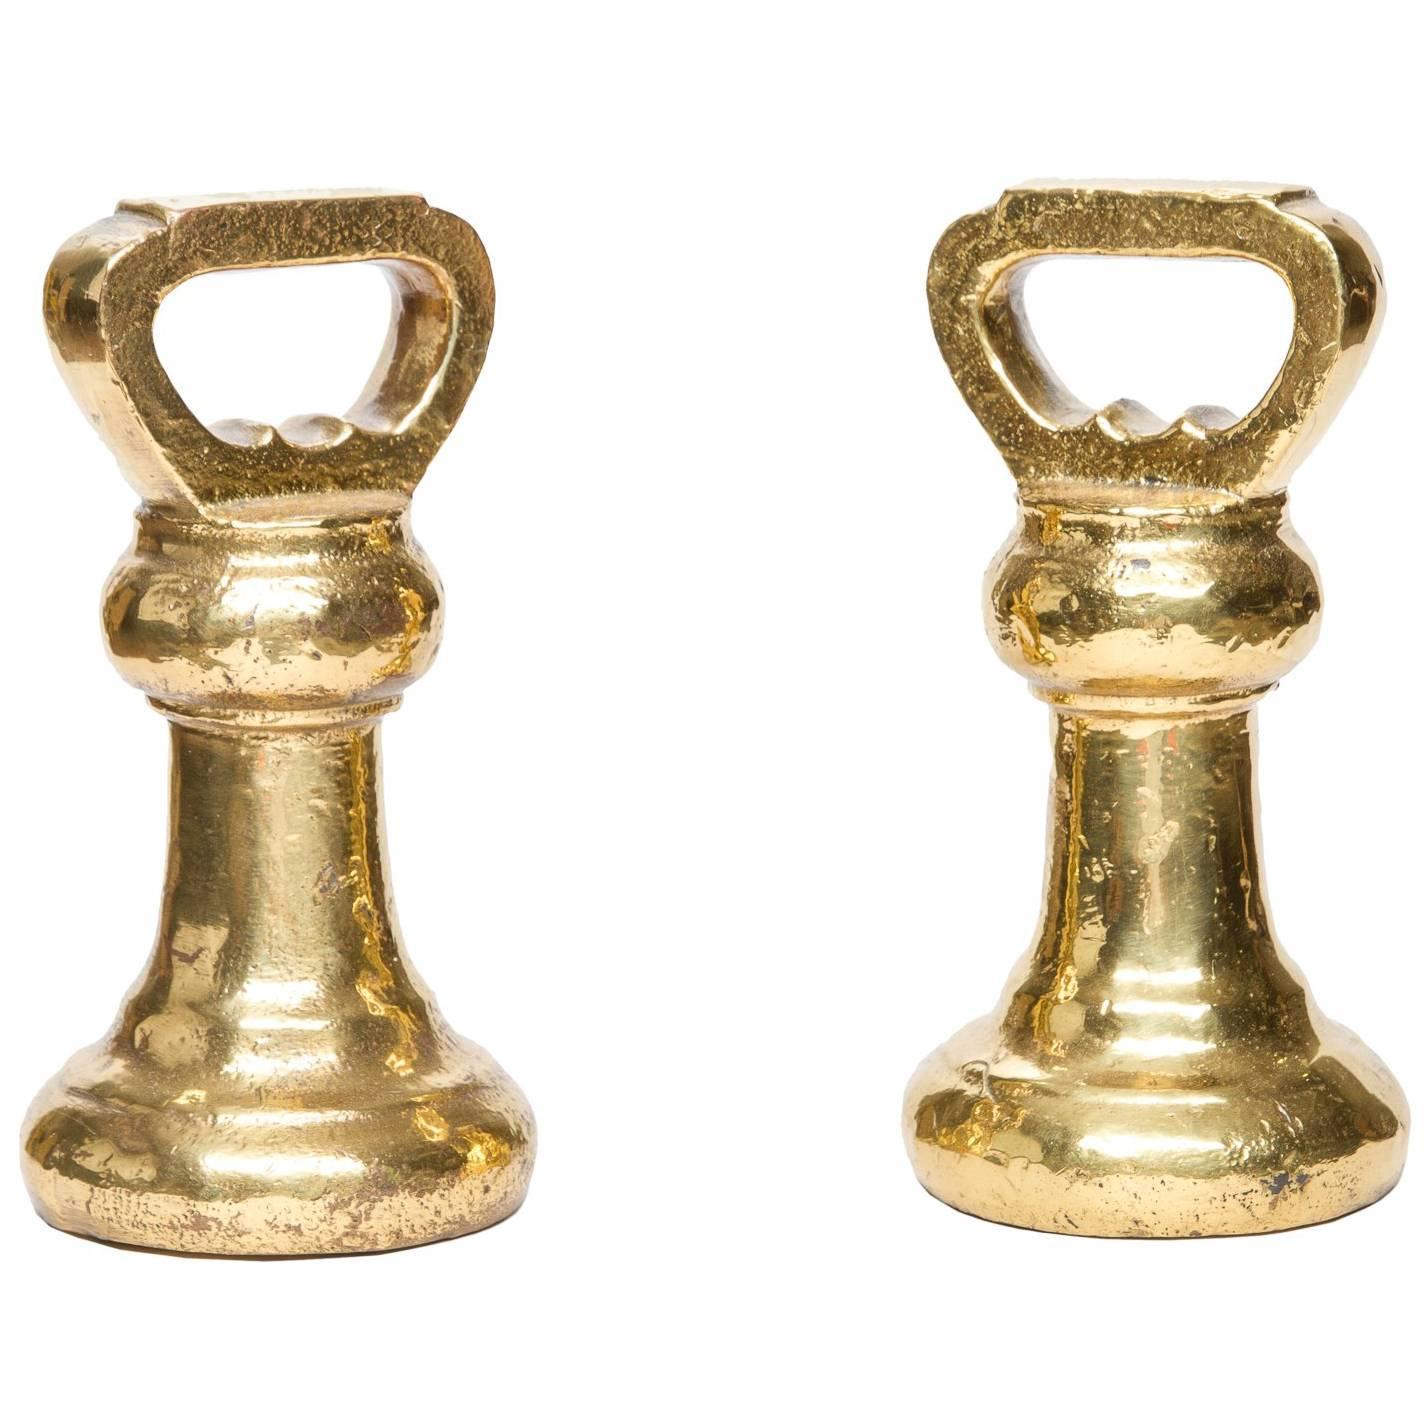 19th Century Pair of Brass Weights